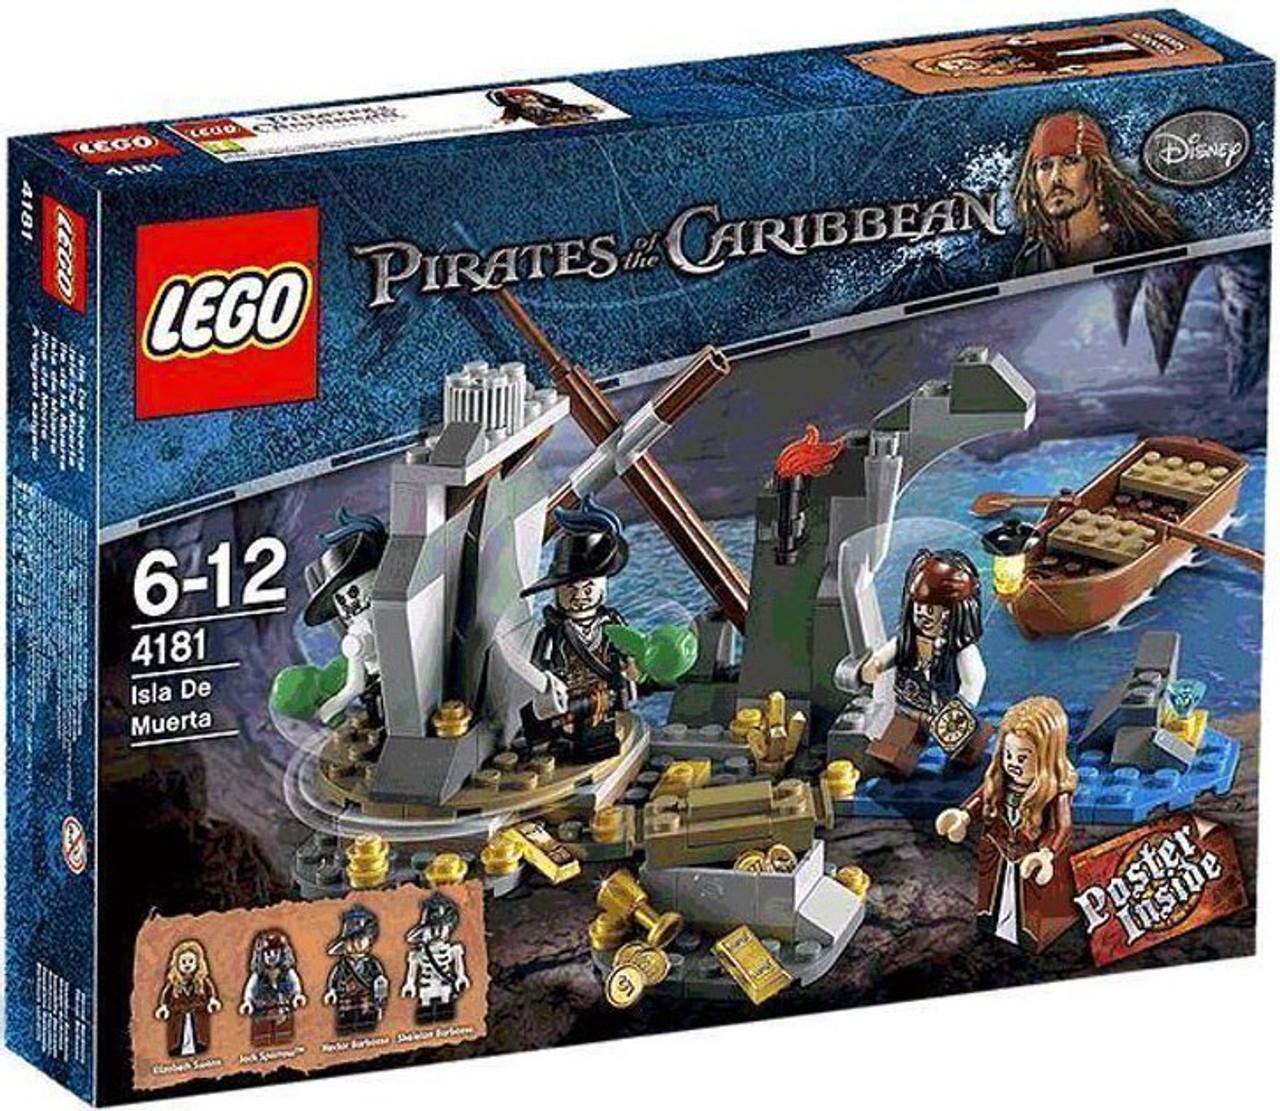 LEGO Pirates of the Caribbean Isla De Muerta Set #4181